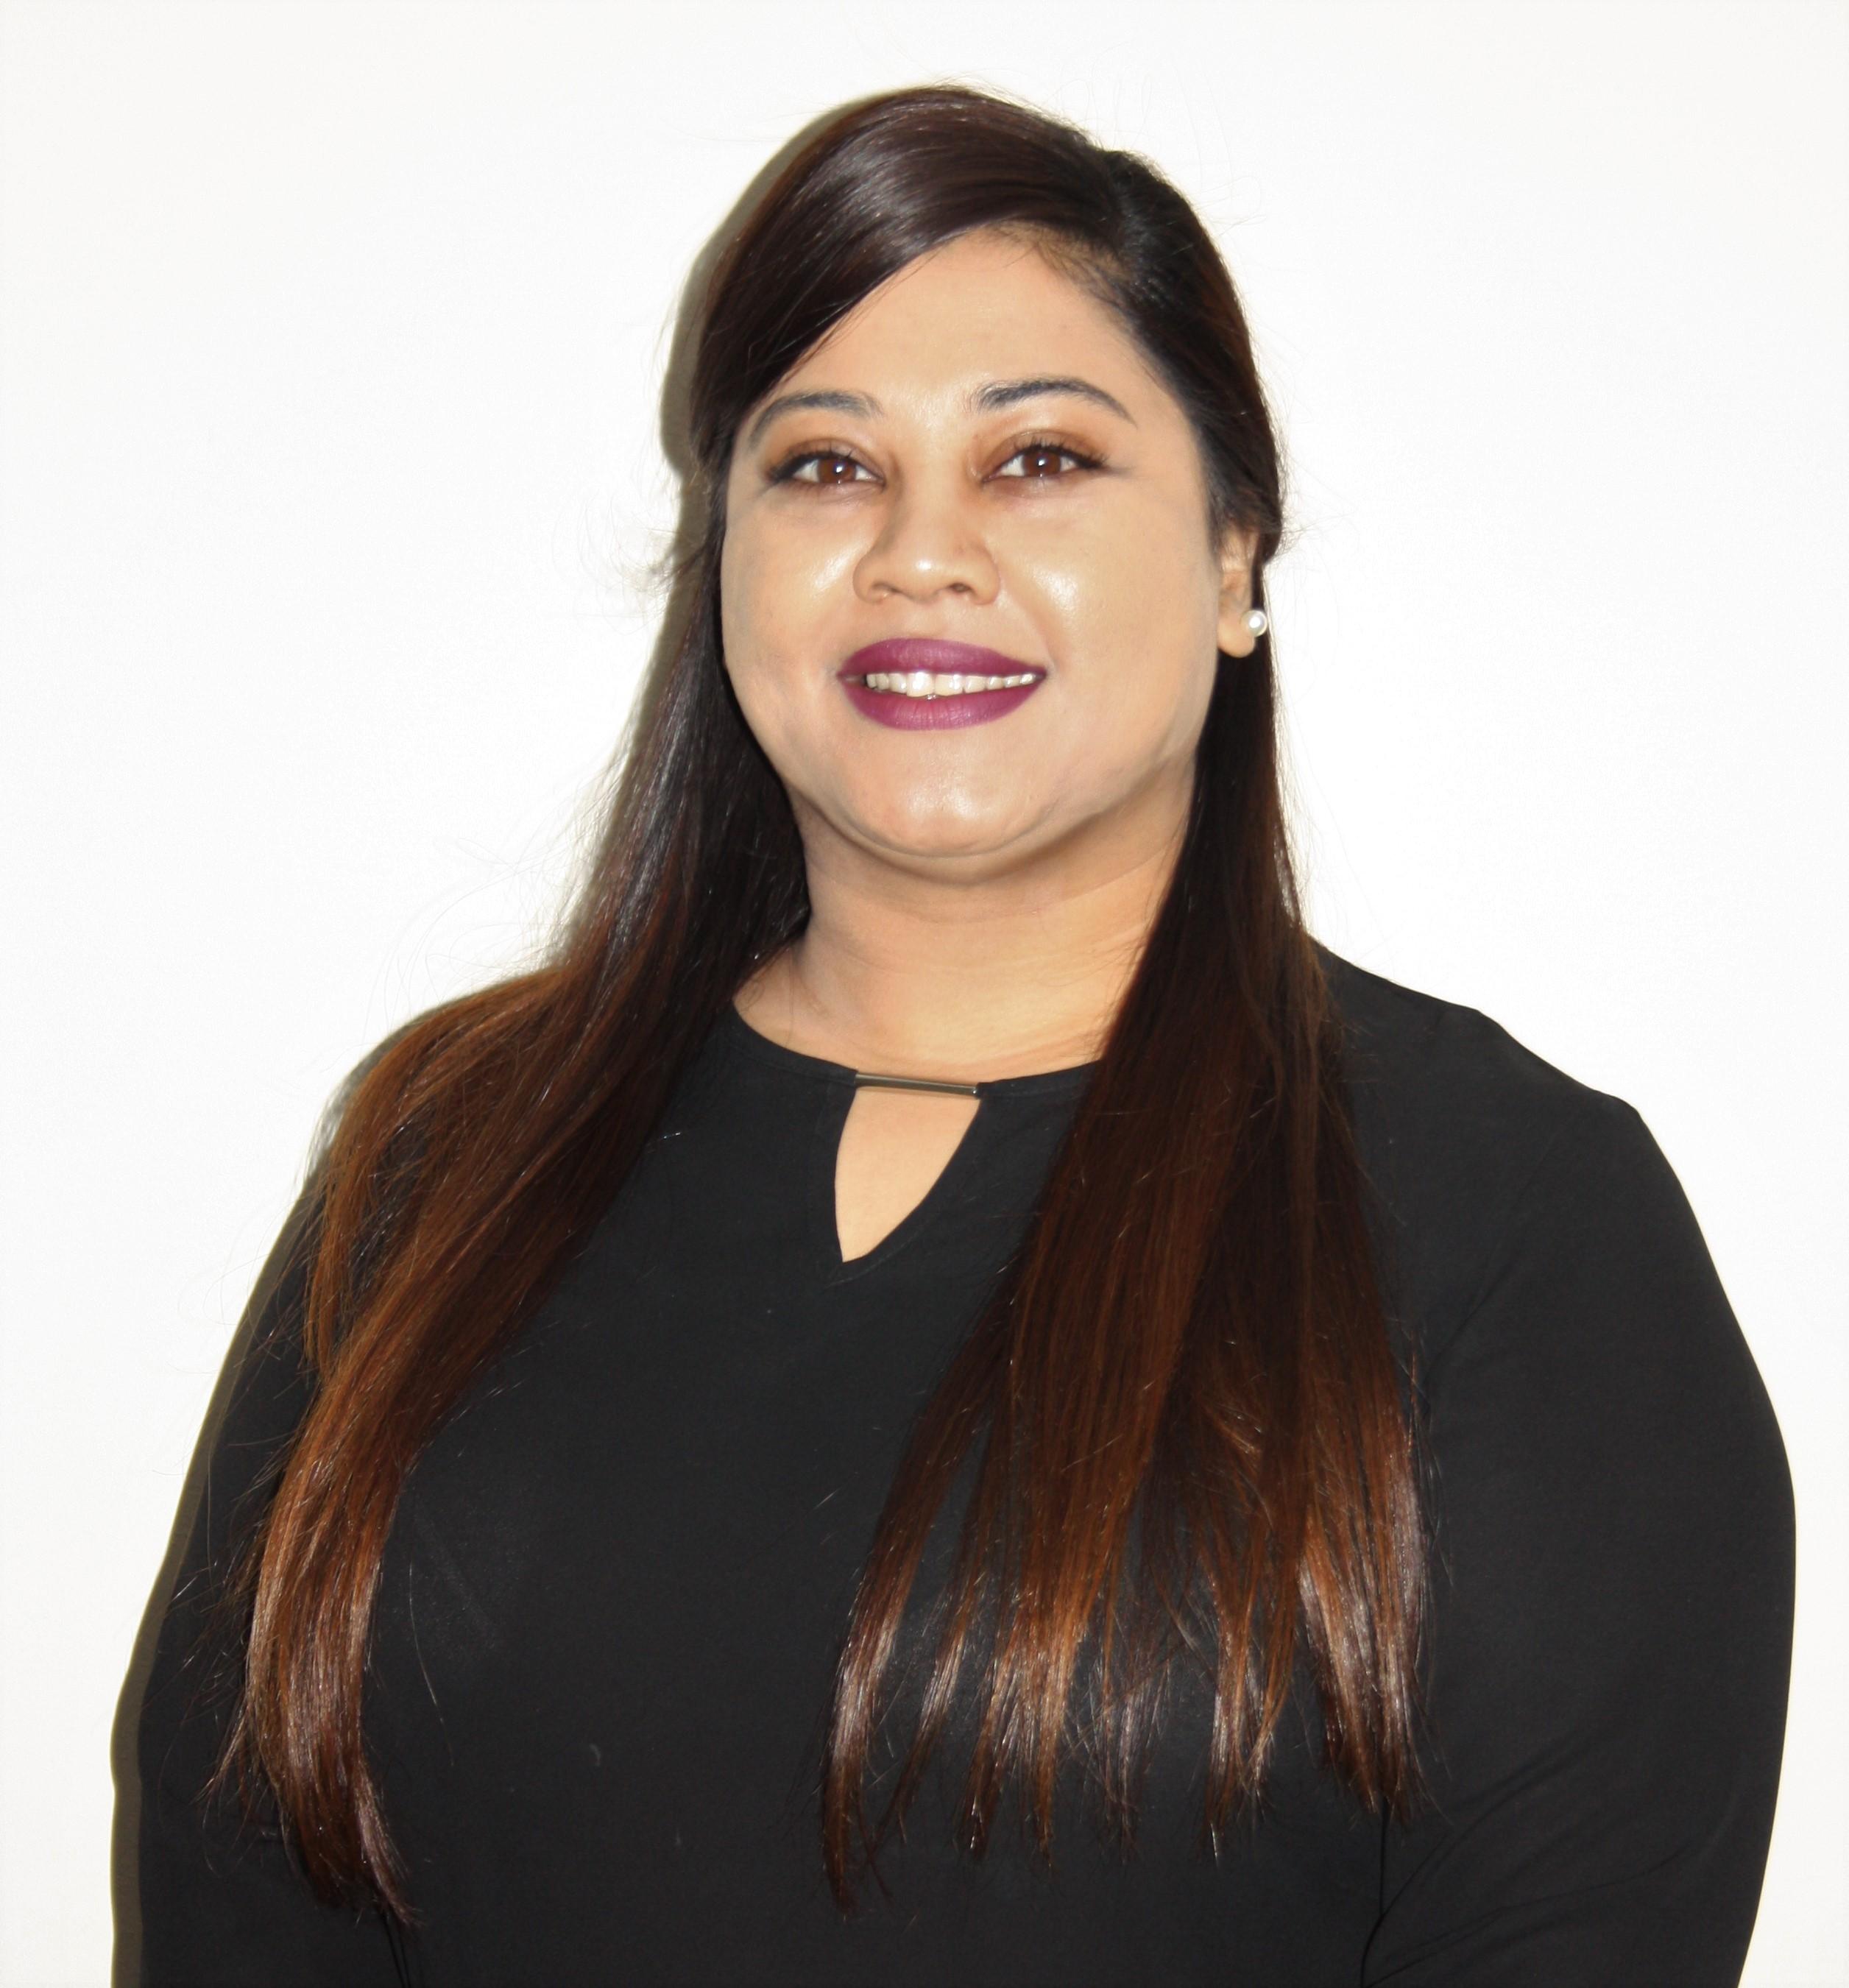 Shaista Singh